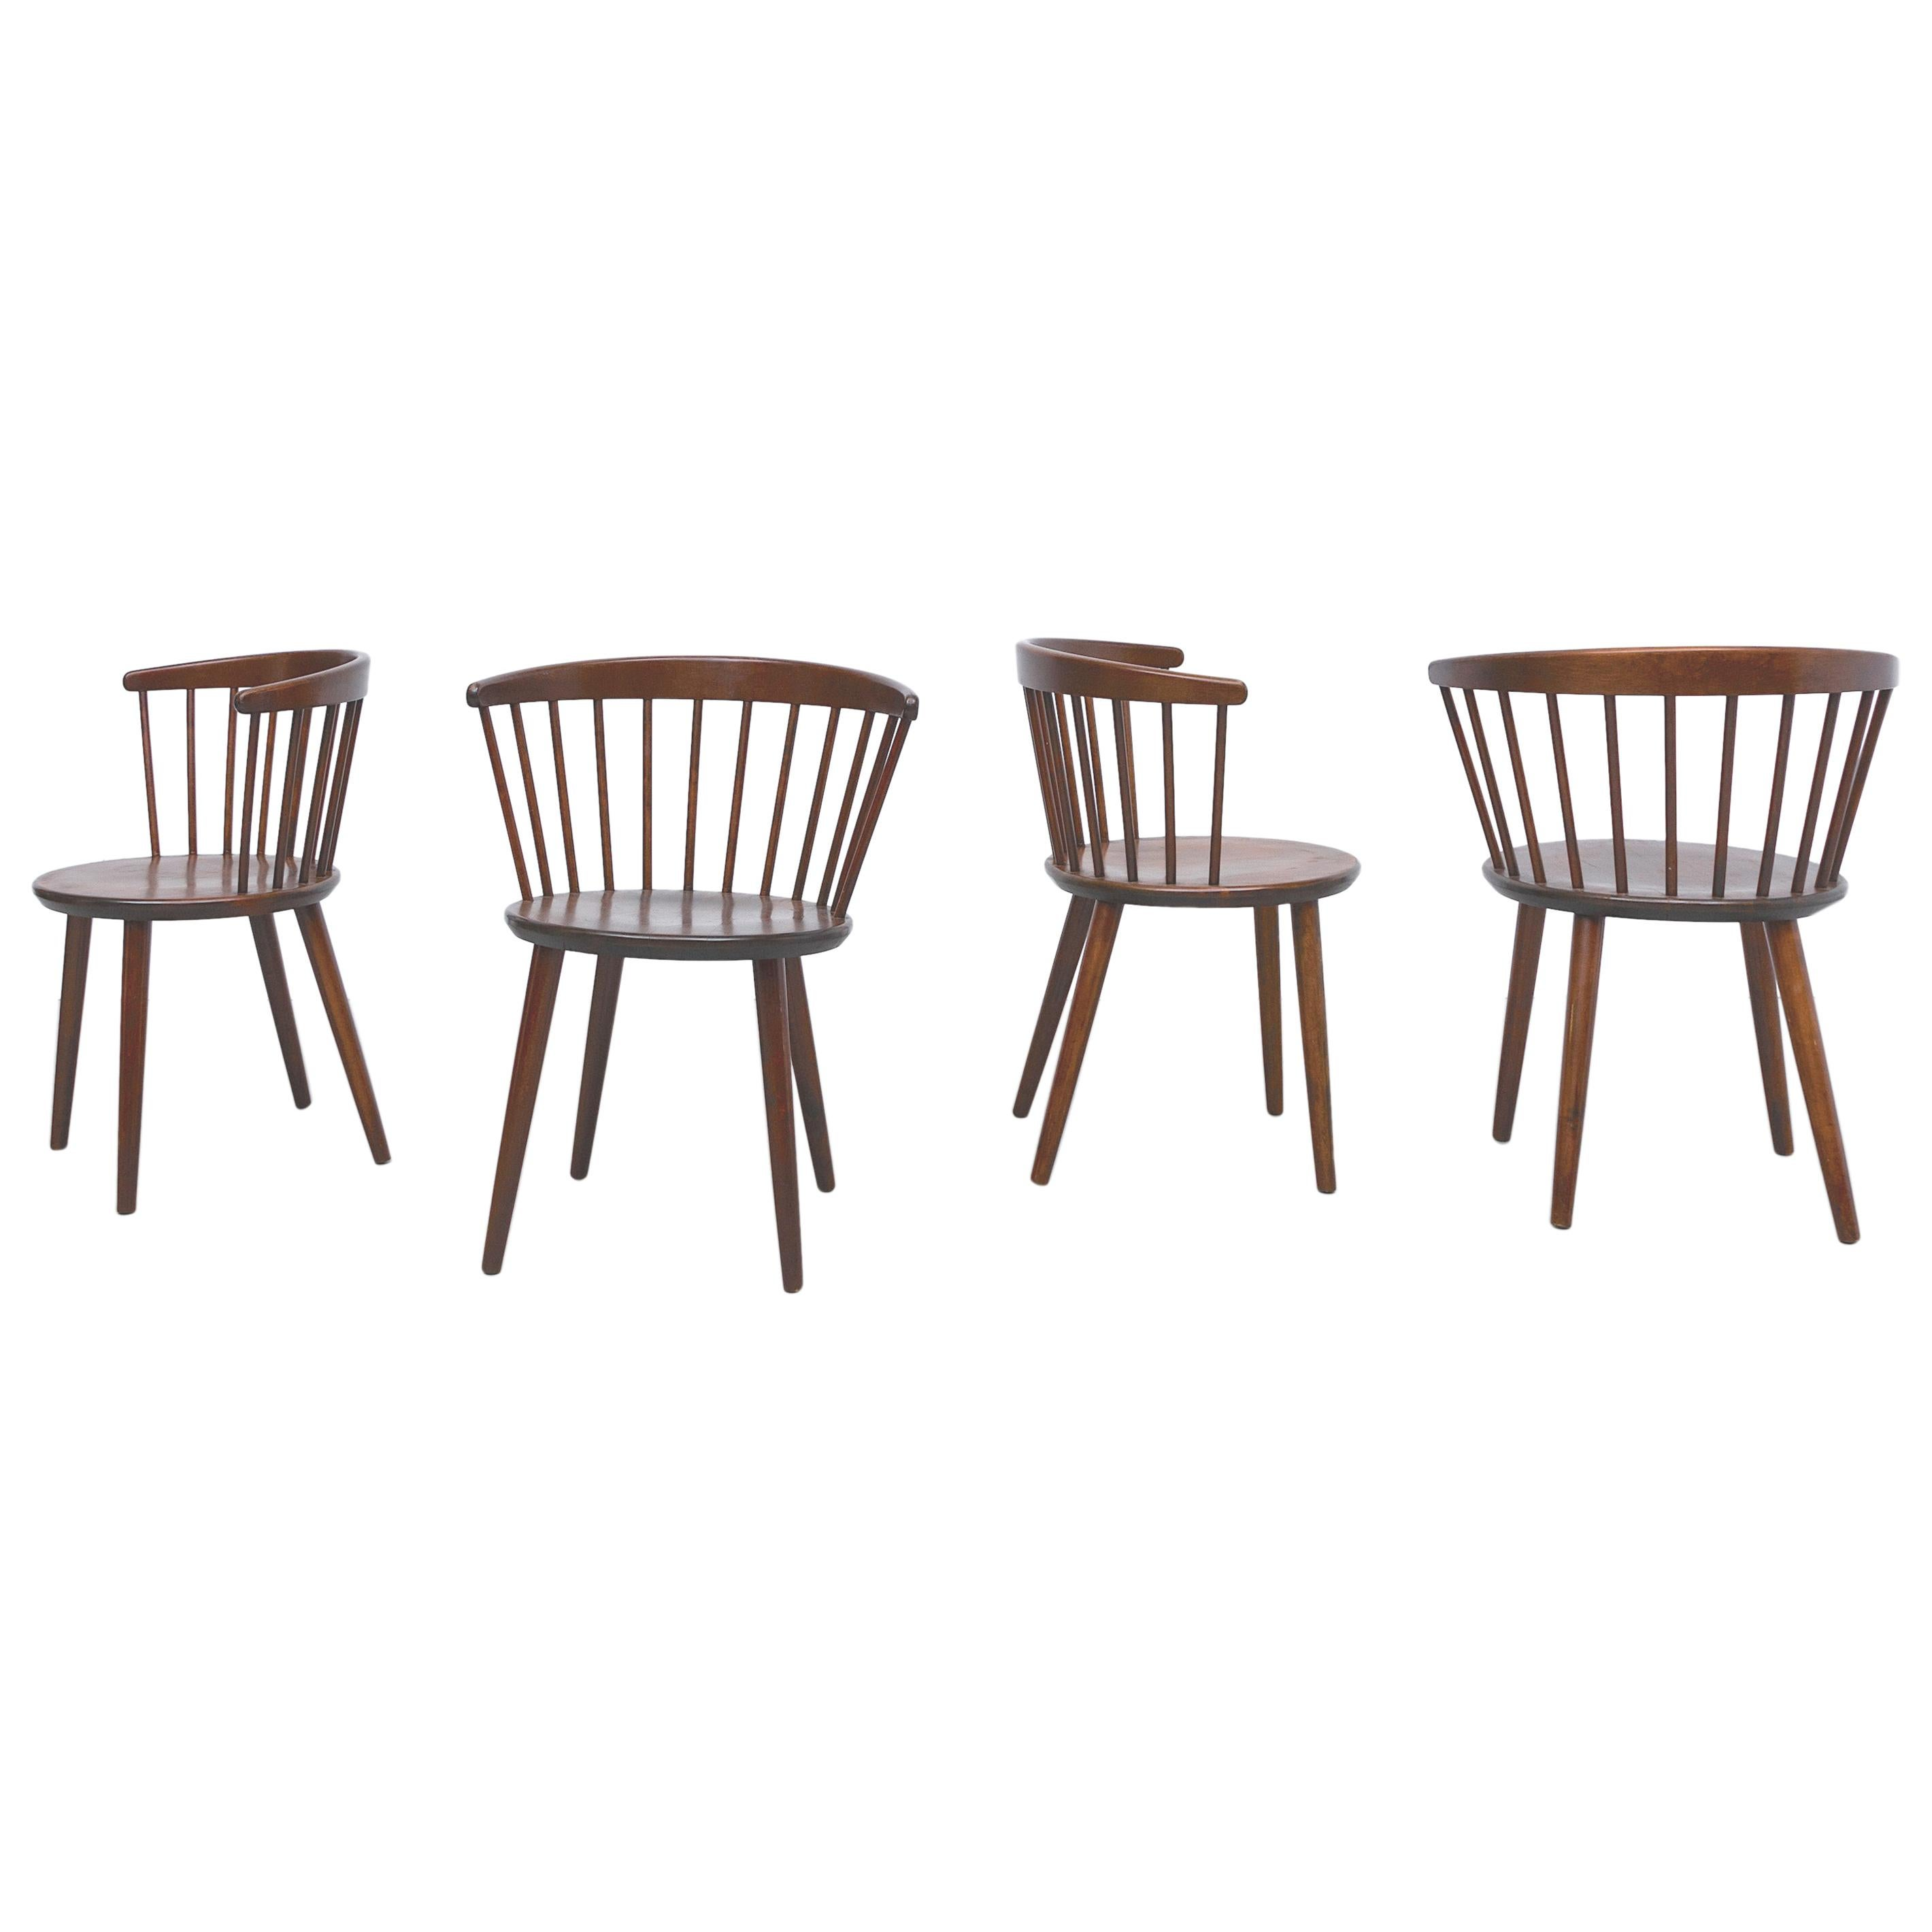 Set of 4 Yngve Ekstrom for Nesto V9 Spindle Back Chairs